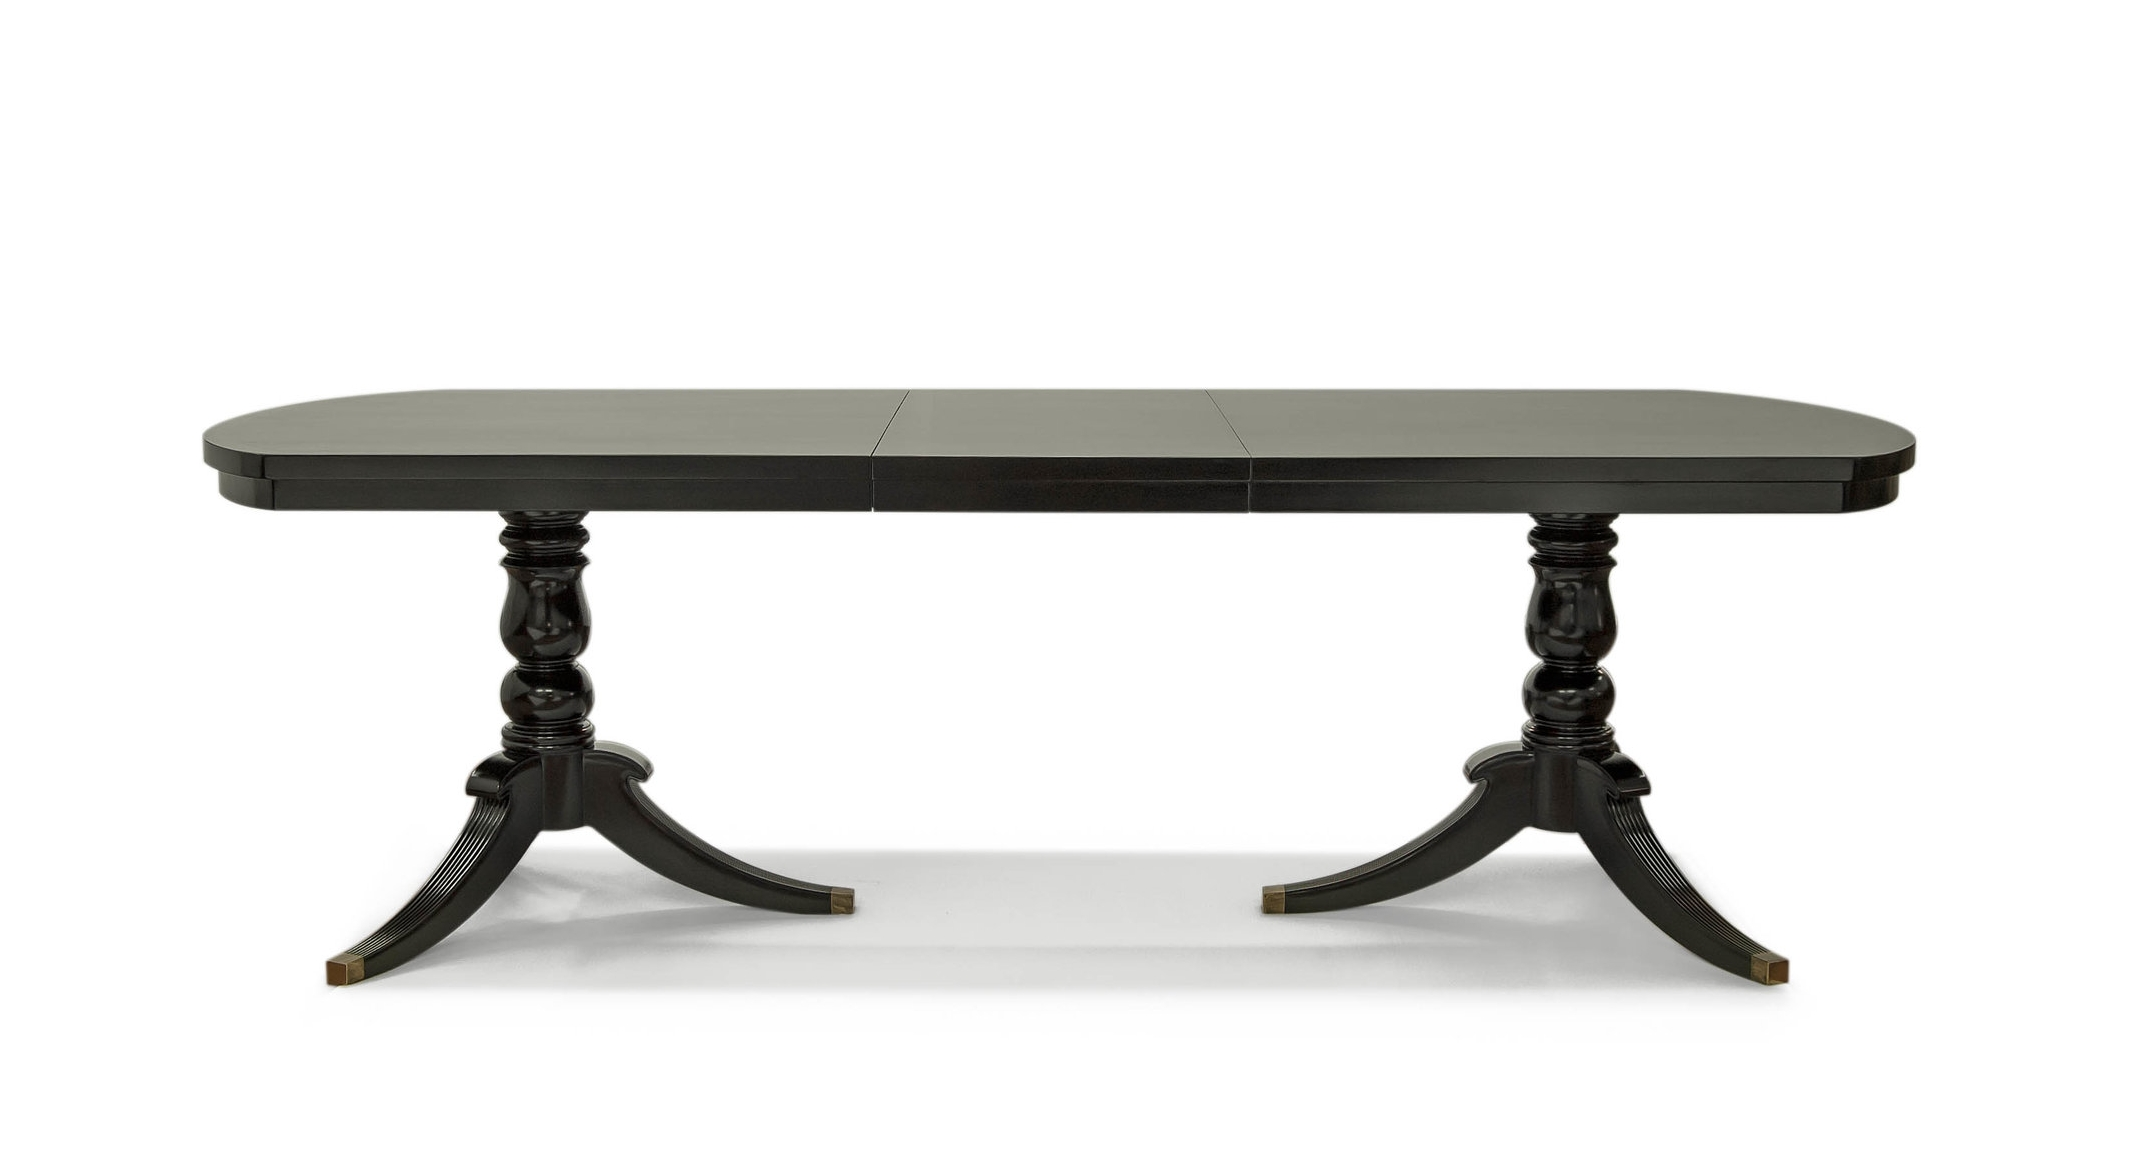 ....bespoke queen anne style furniture : extendable dining table..特别定制安妮皇后款色家具 : 可拉开餐台....